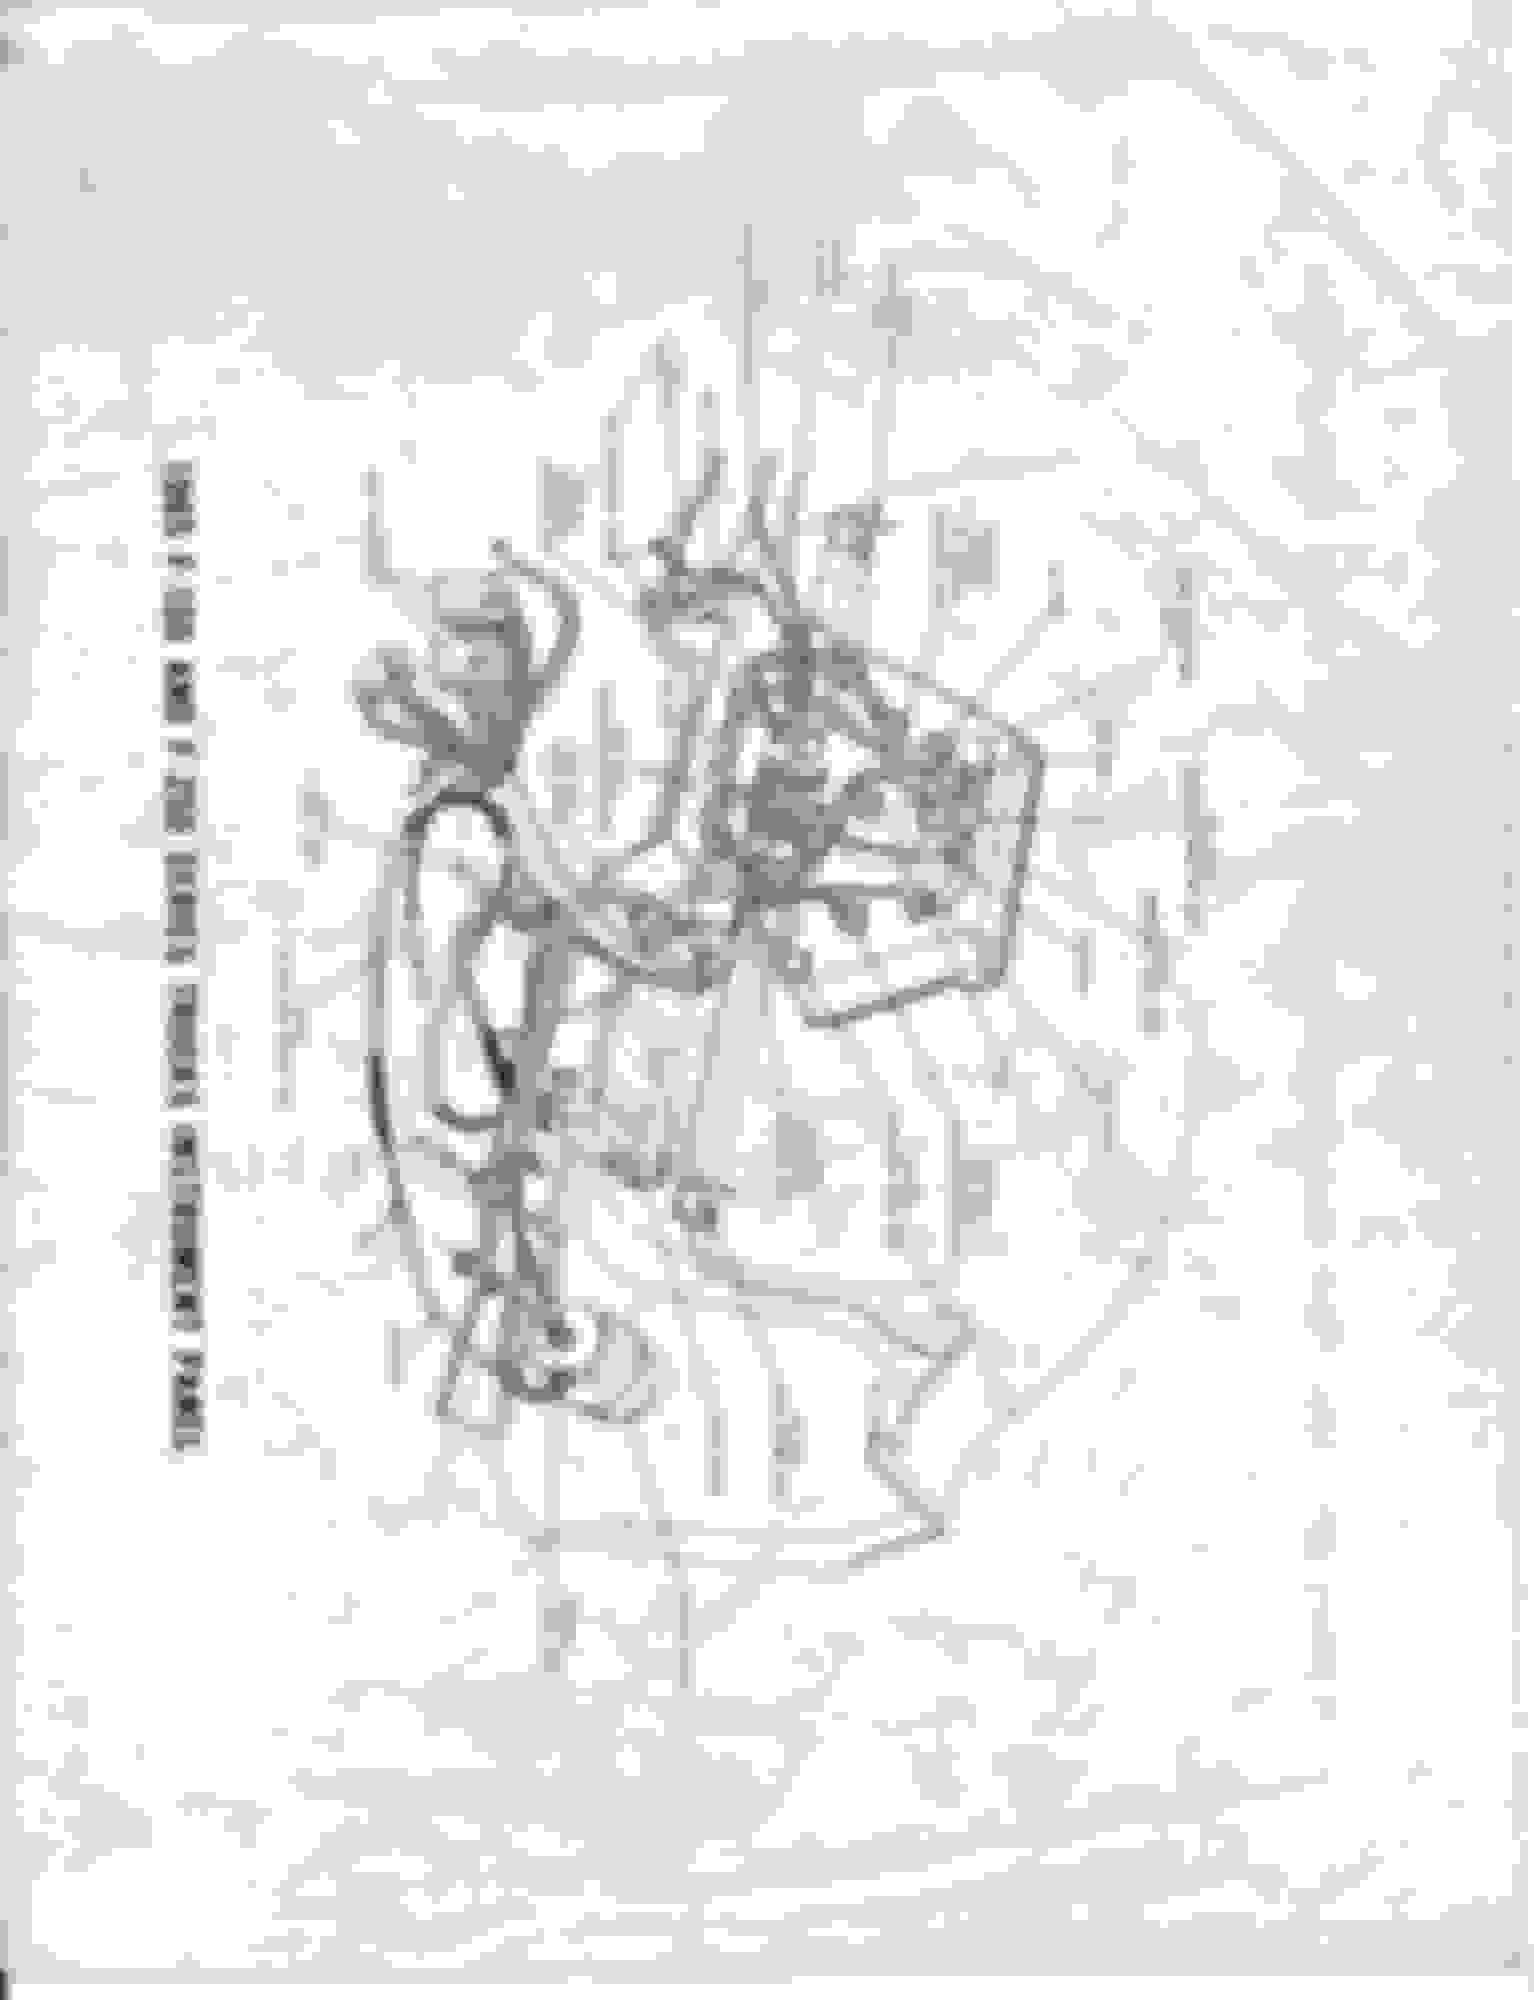 Wiring Diagram For 1965 Ford F100 1965 Ford Falcon Wiringdiagram